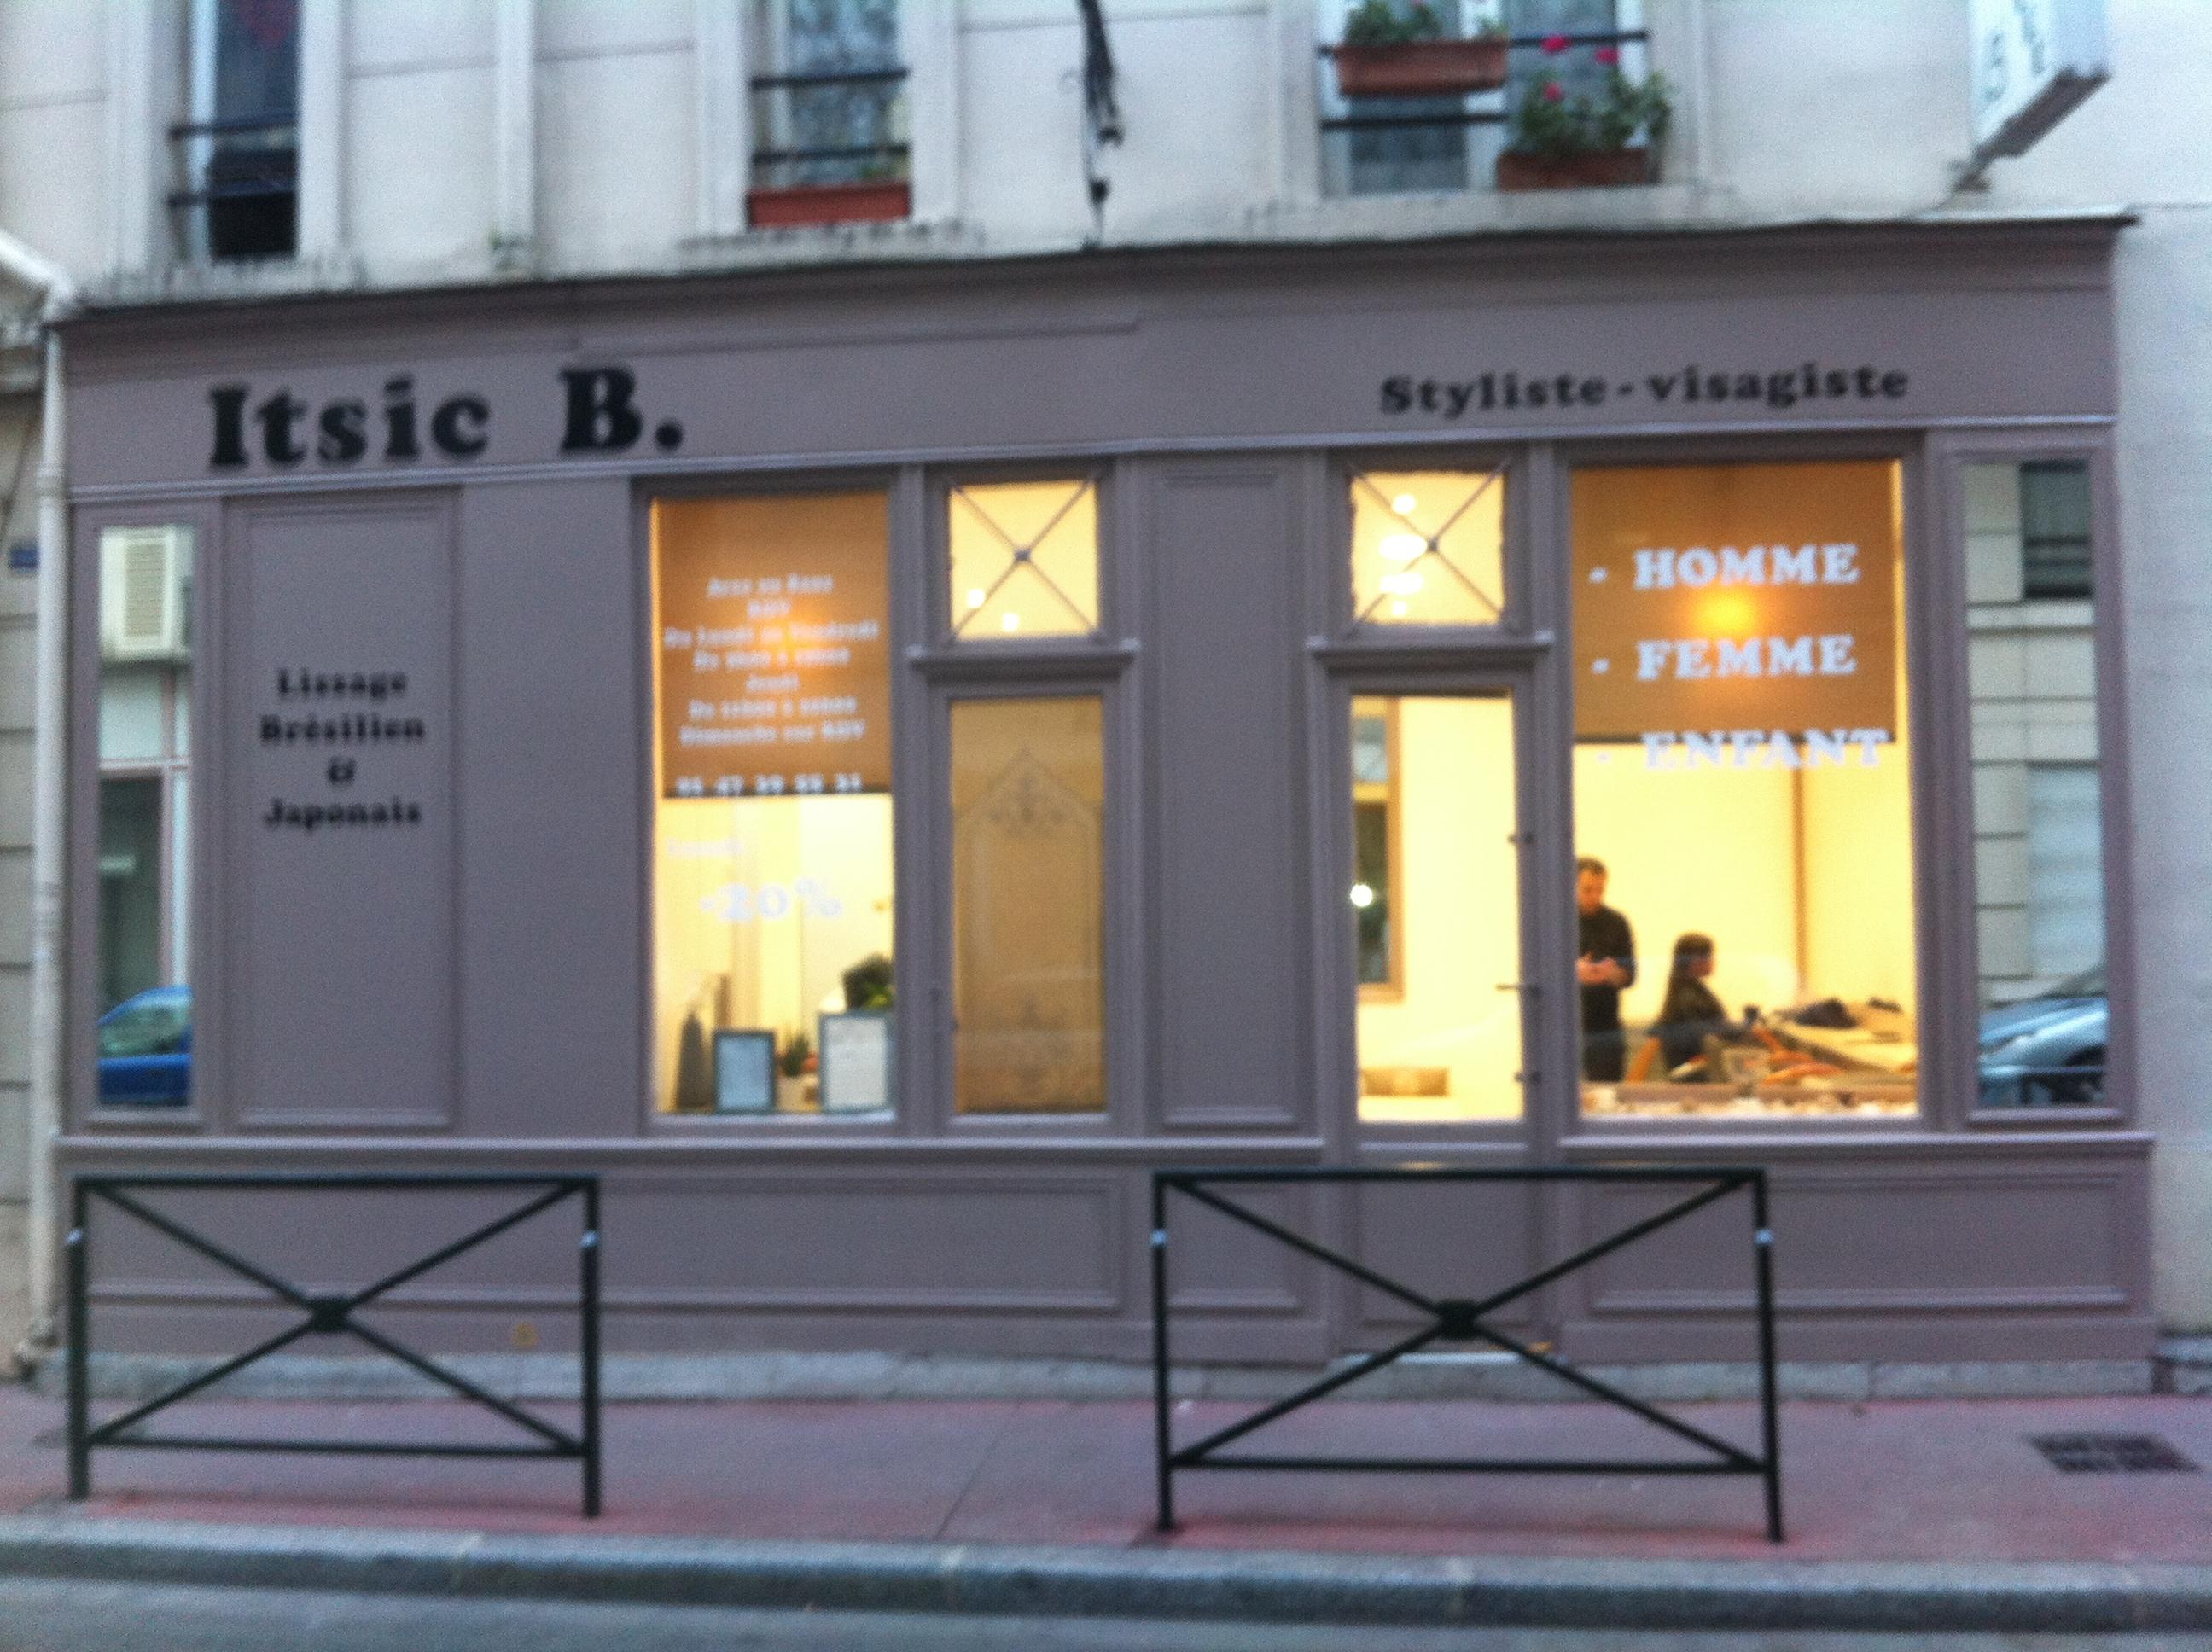 Itsic b levallois perret avis tarifs horaires t l phone for Salon de coiffure levallois